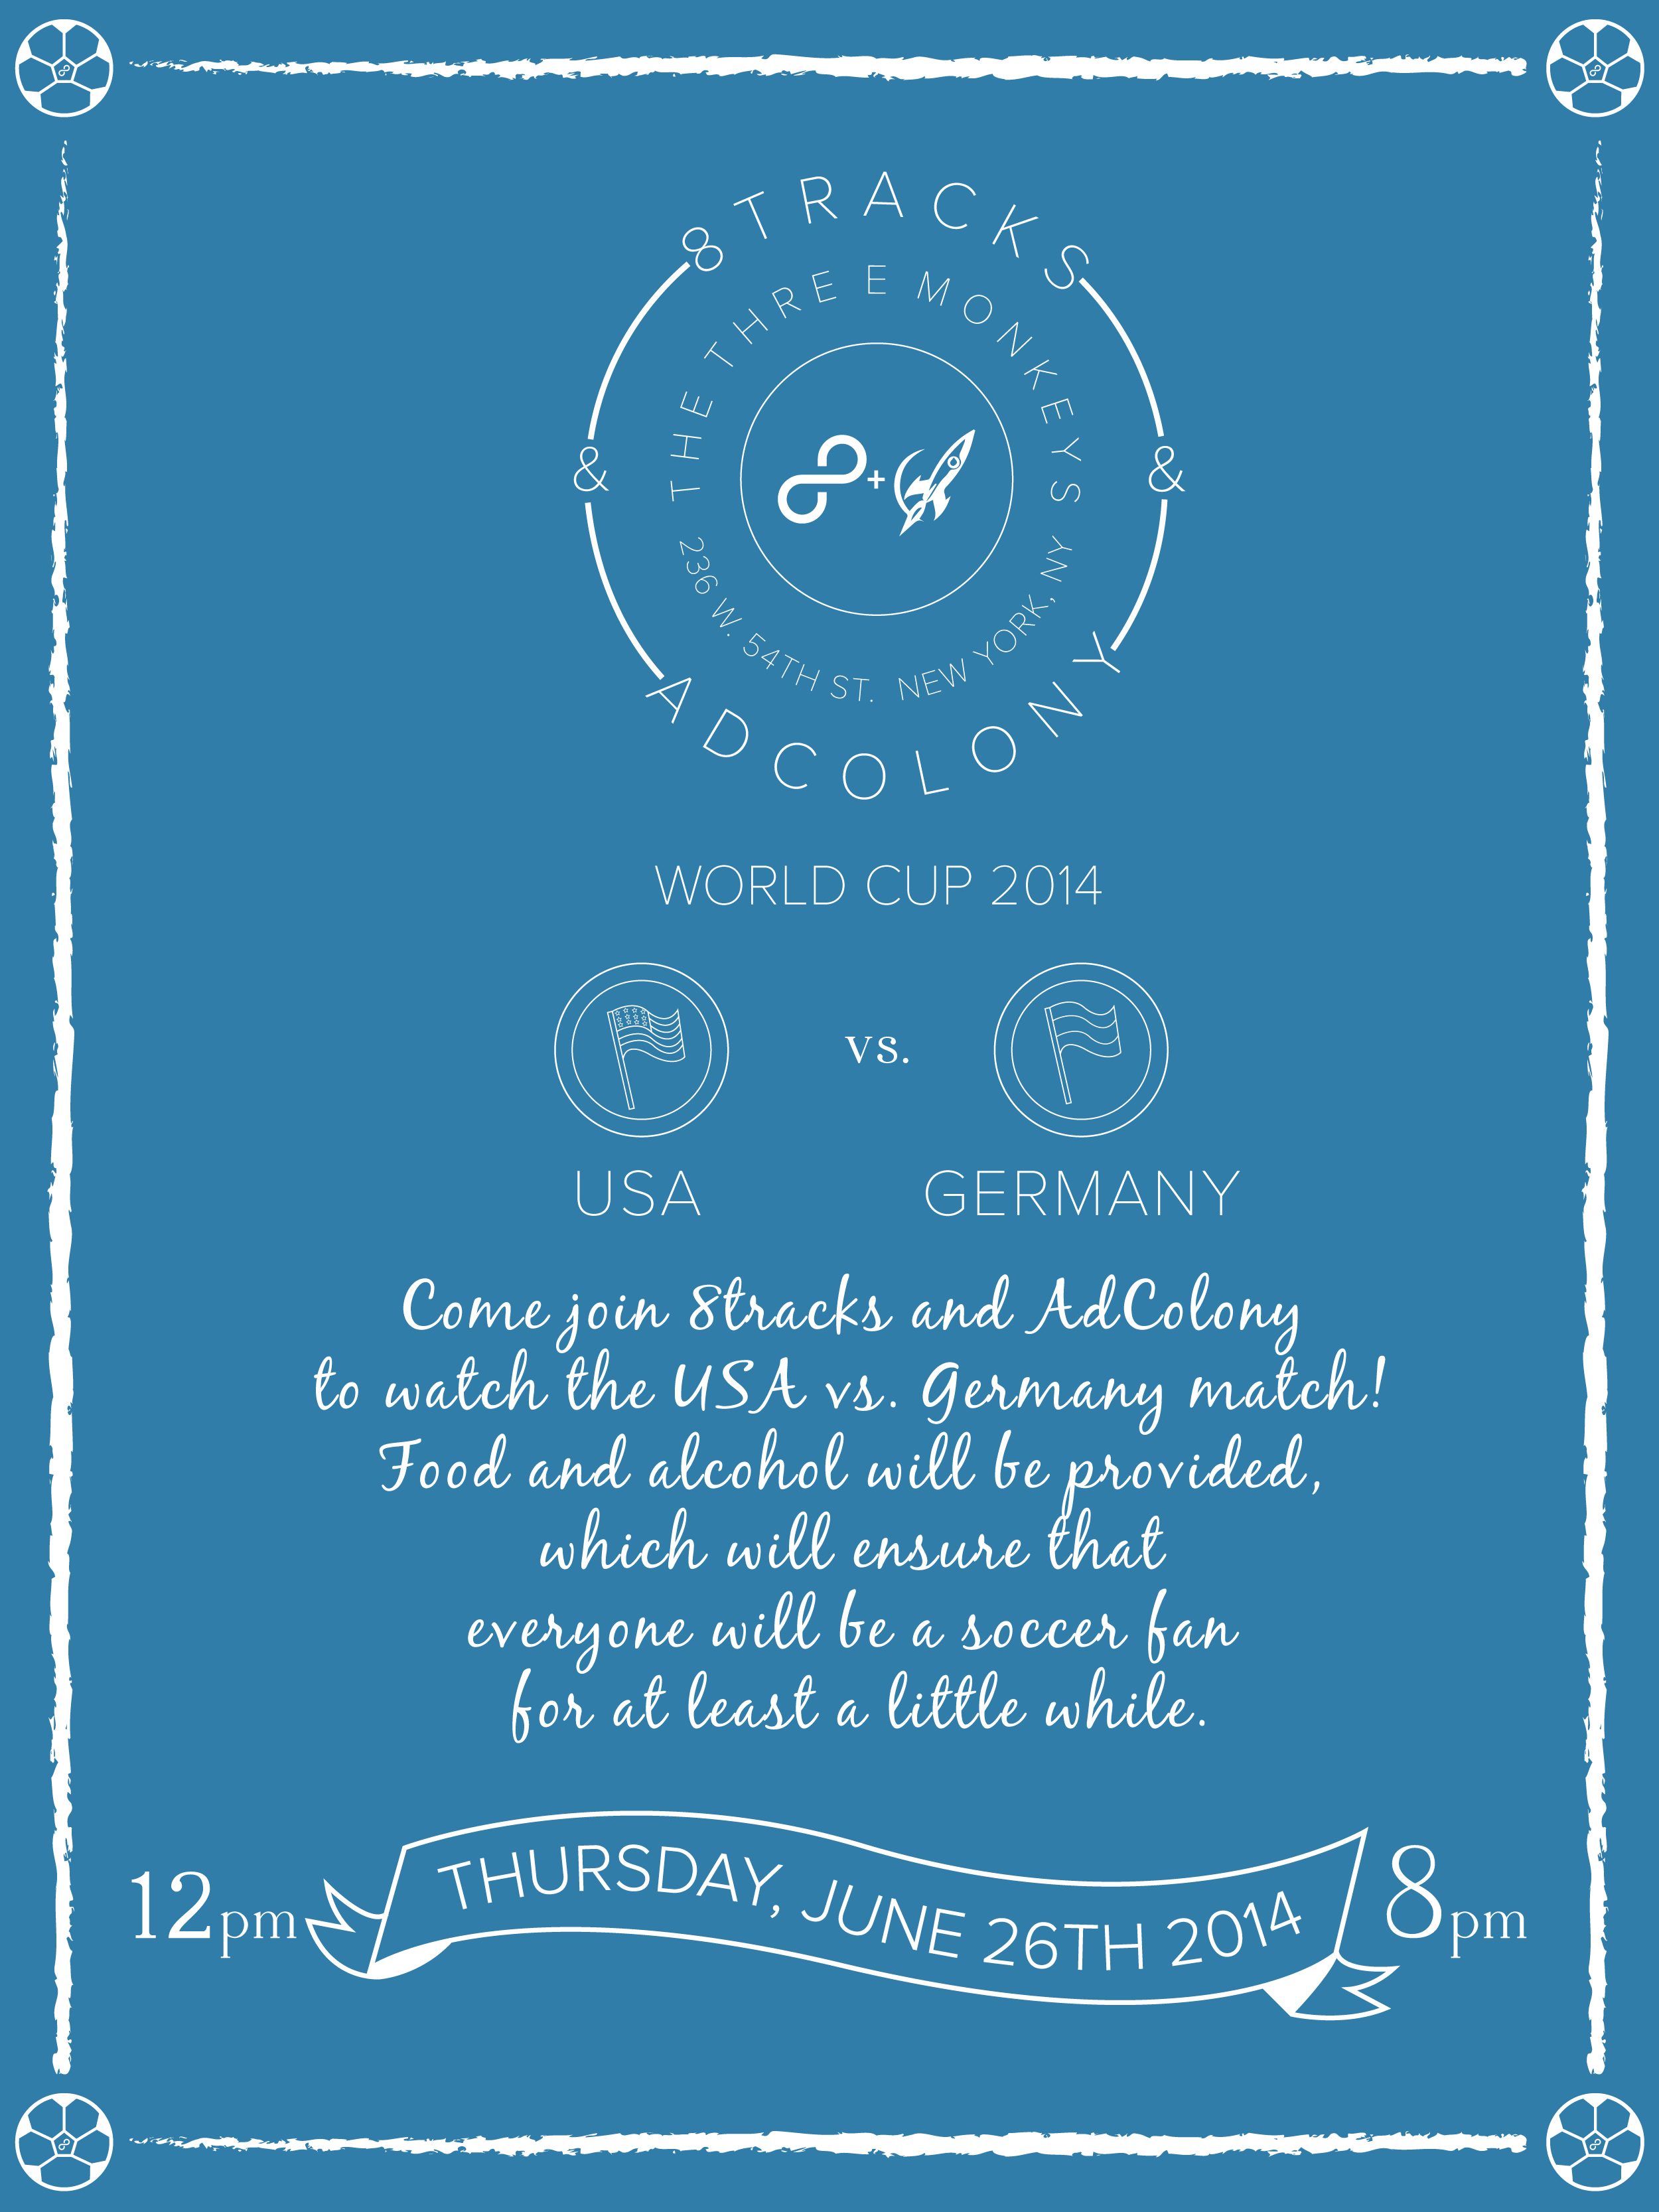 8tracks x Adcolony World Cup   brand/identity, visual design, print design